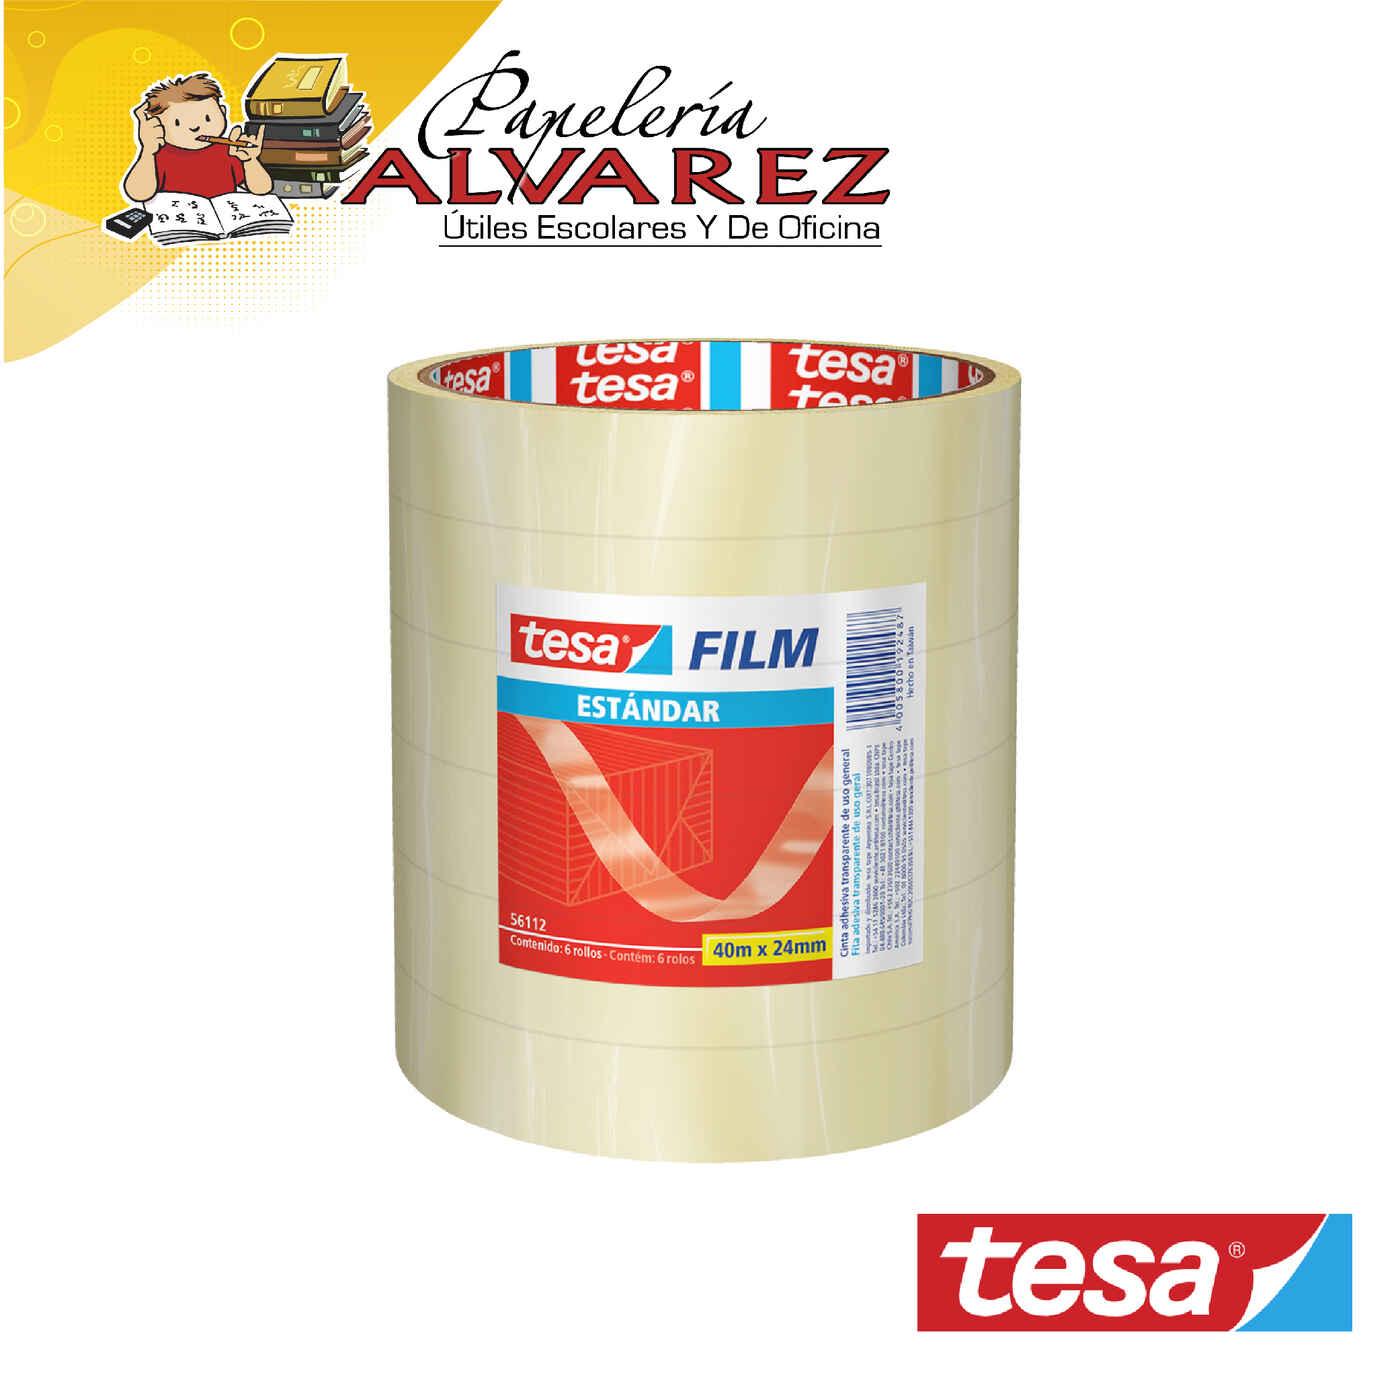 CINTA TESA 24MM X 40 MTS (IMPRONTA) TRANSPARENTE